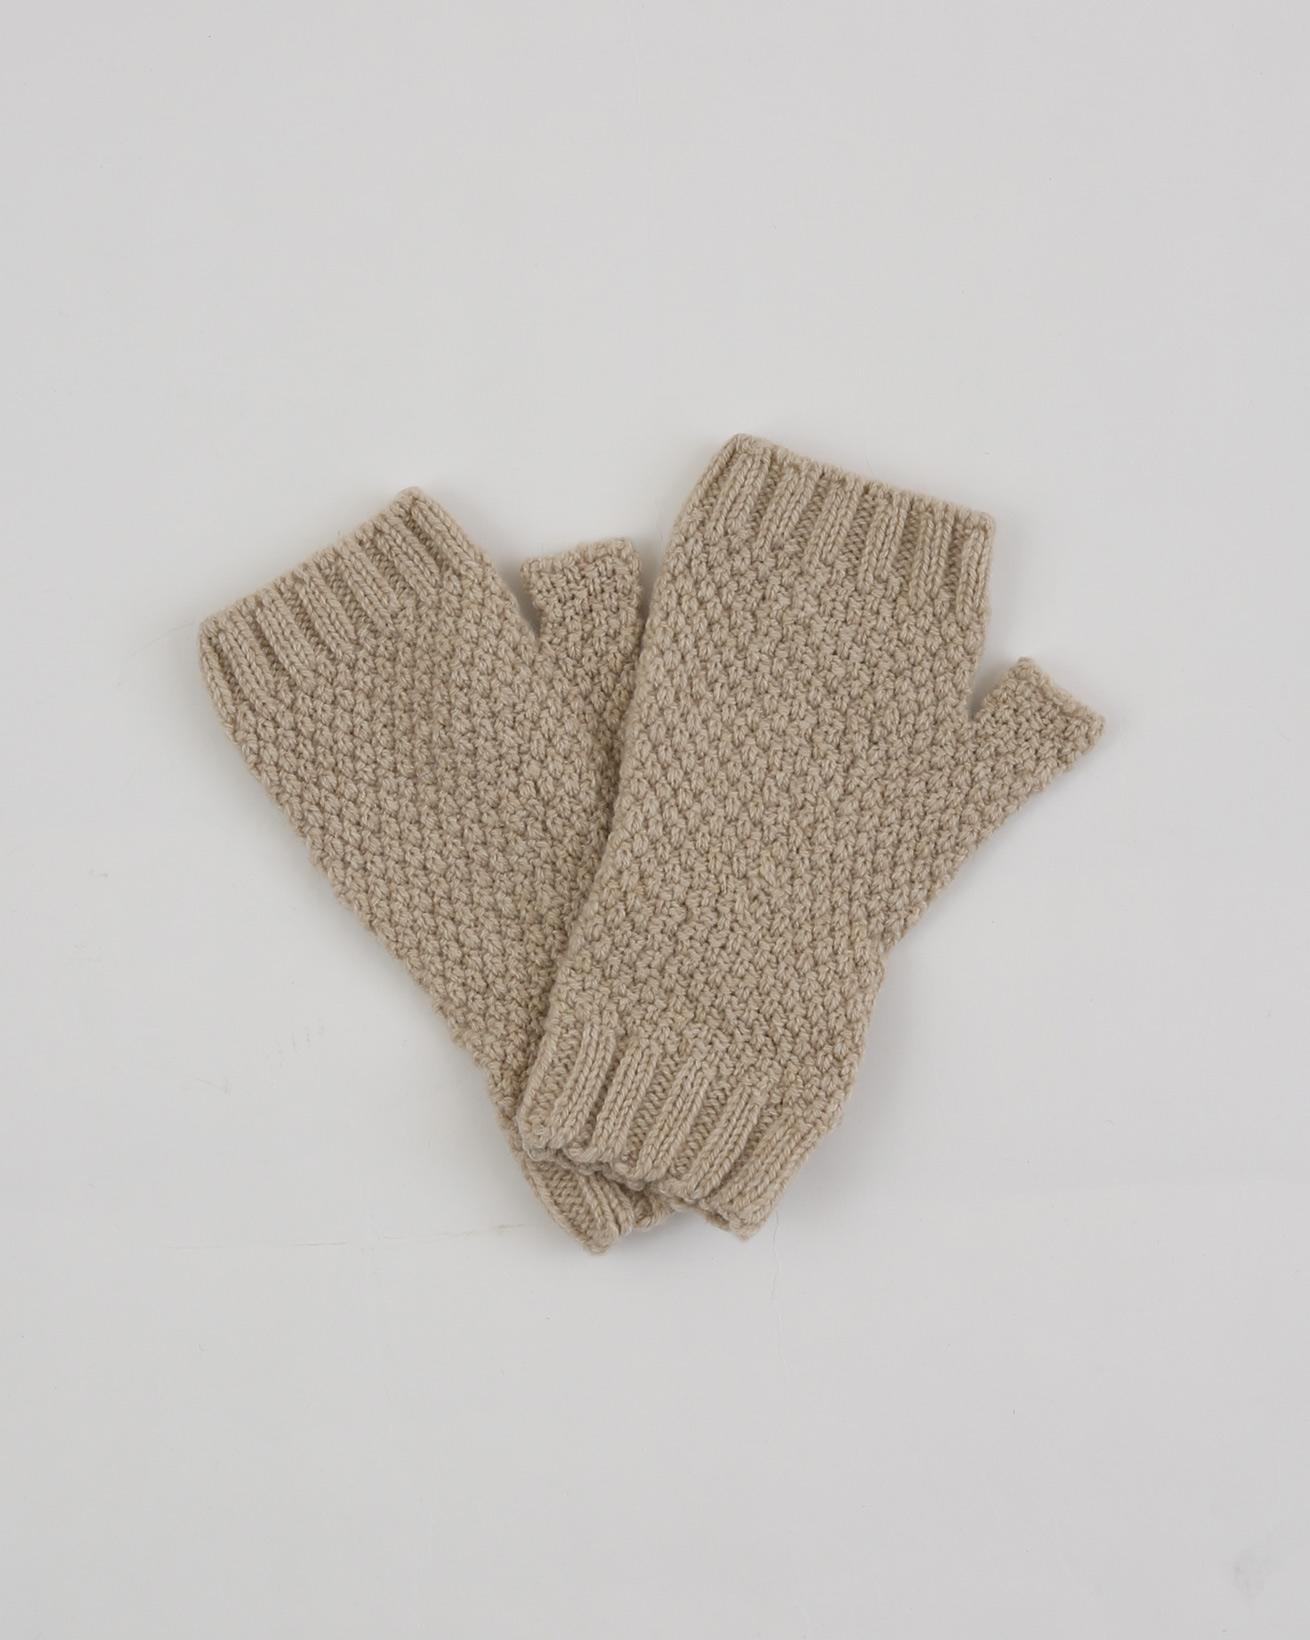 Lambswool Moss Stitch Fingerless Mitt - One Size - Oatmeal - 1893